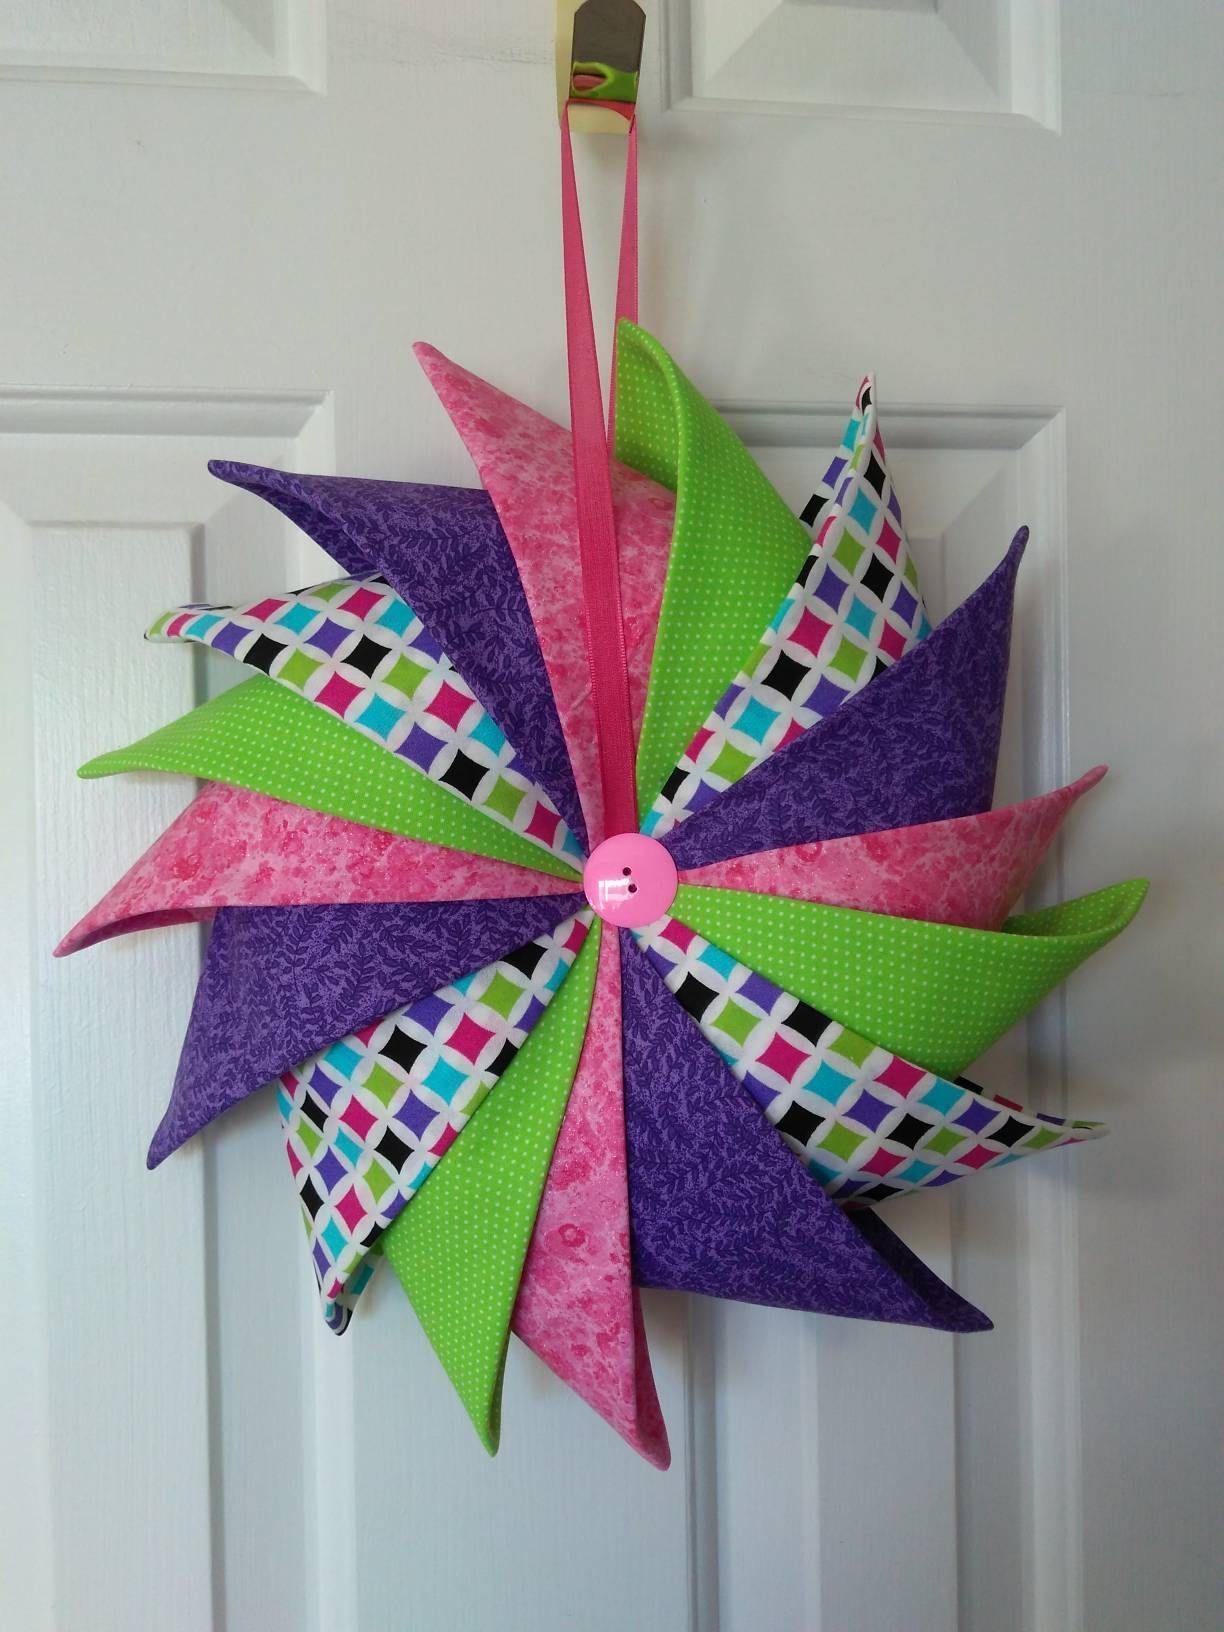 Photo of Folder Fabric Wreath, Easter Wreath, Spring Wreath, Prairie Point Wreath, Pinwheel Wreath, Pastel Decor, Wall Hanging, Door Hanging, Wreath